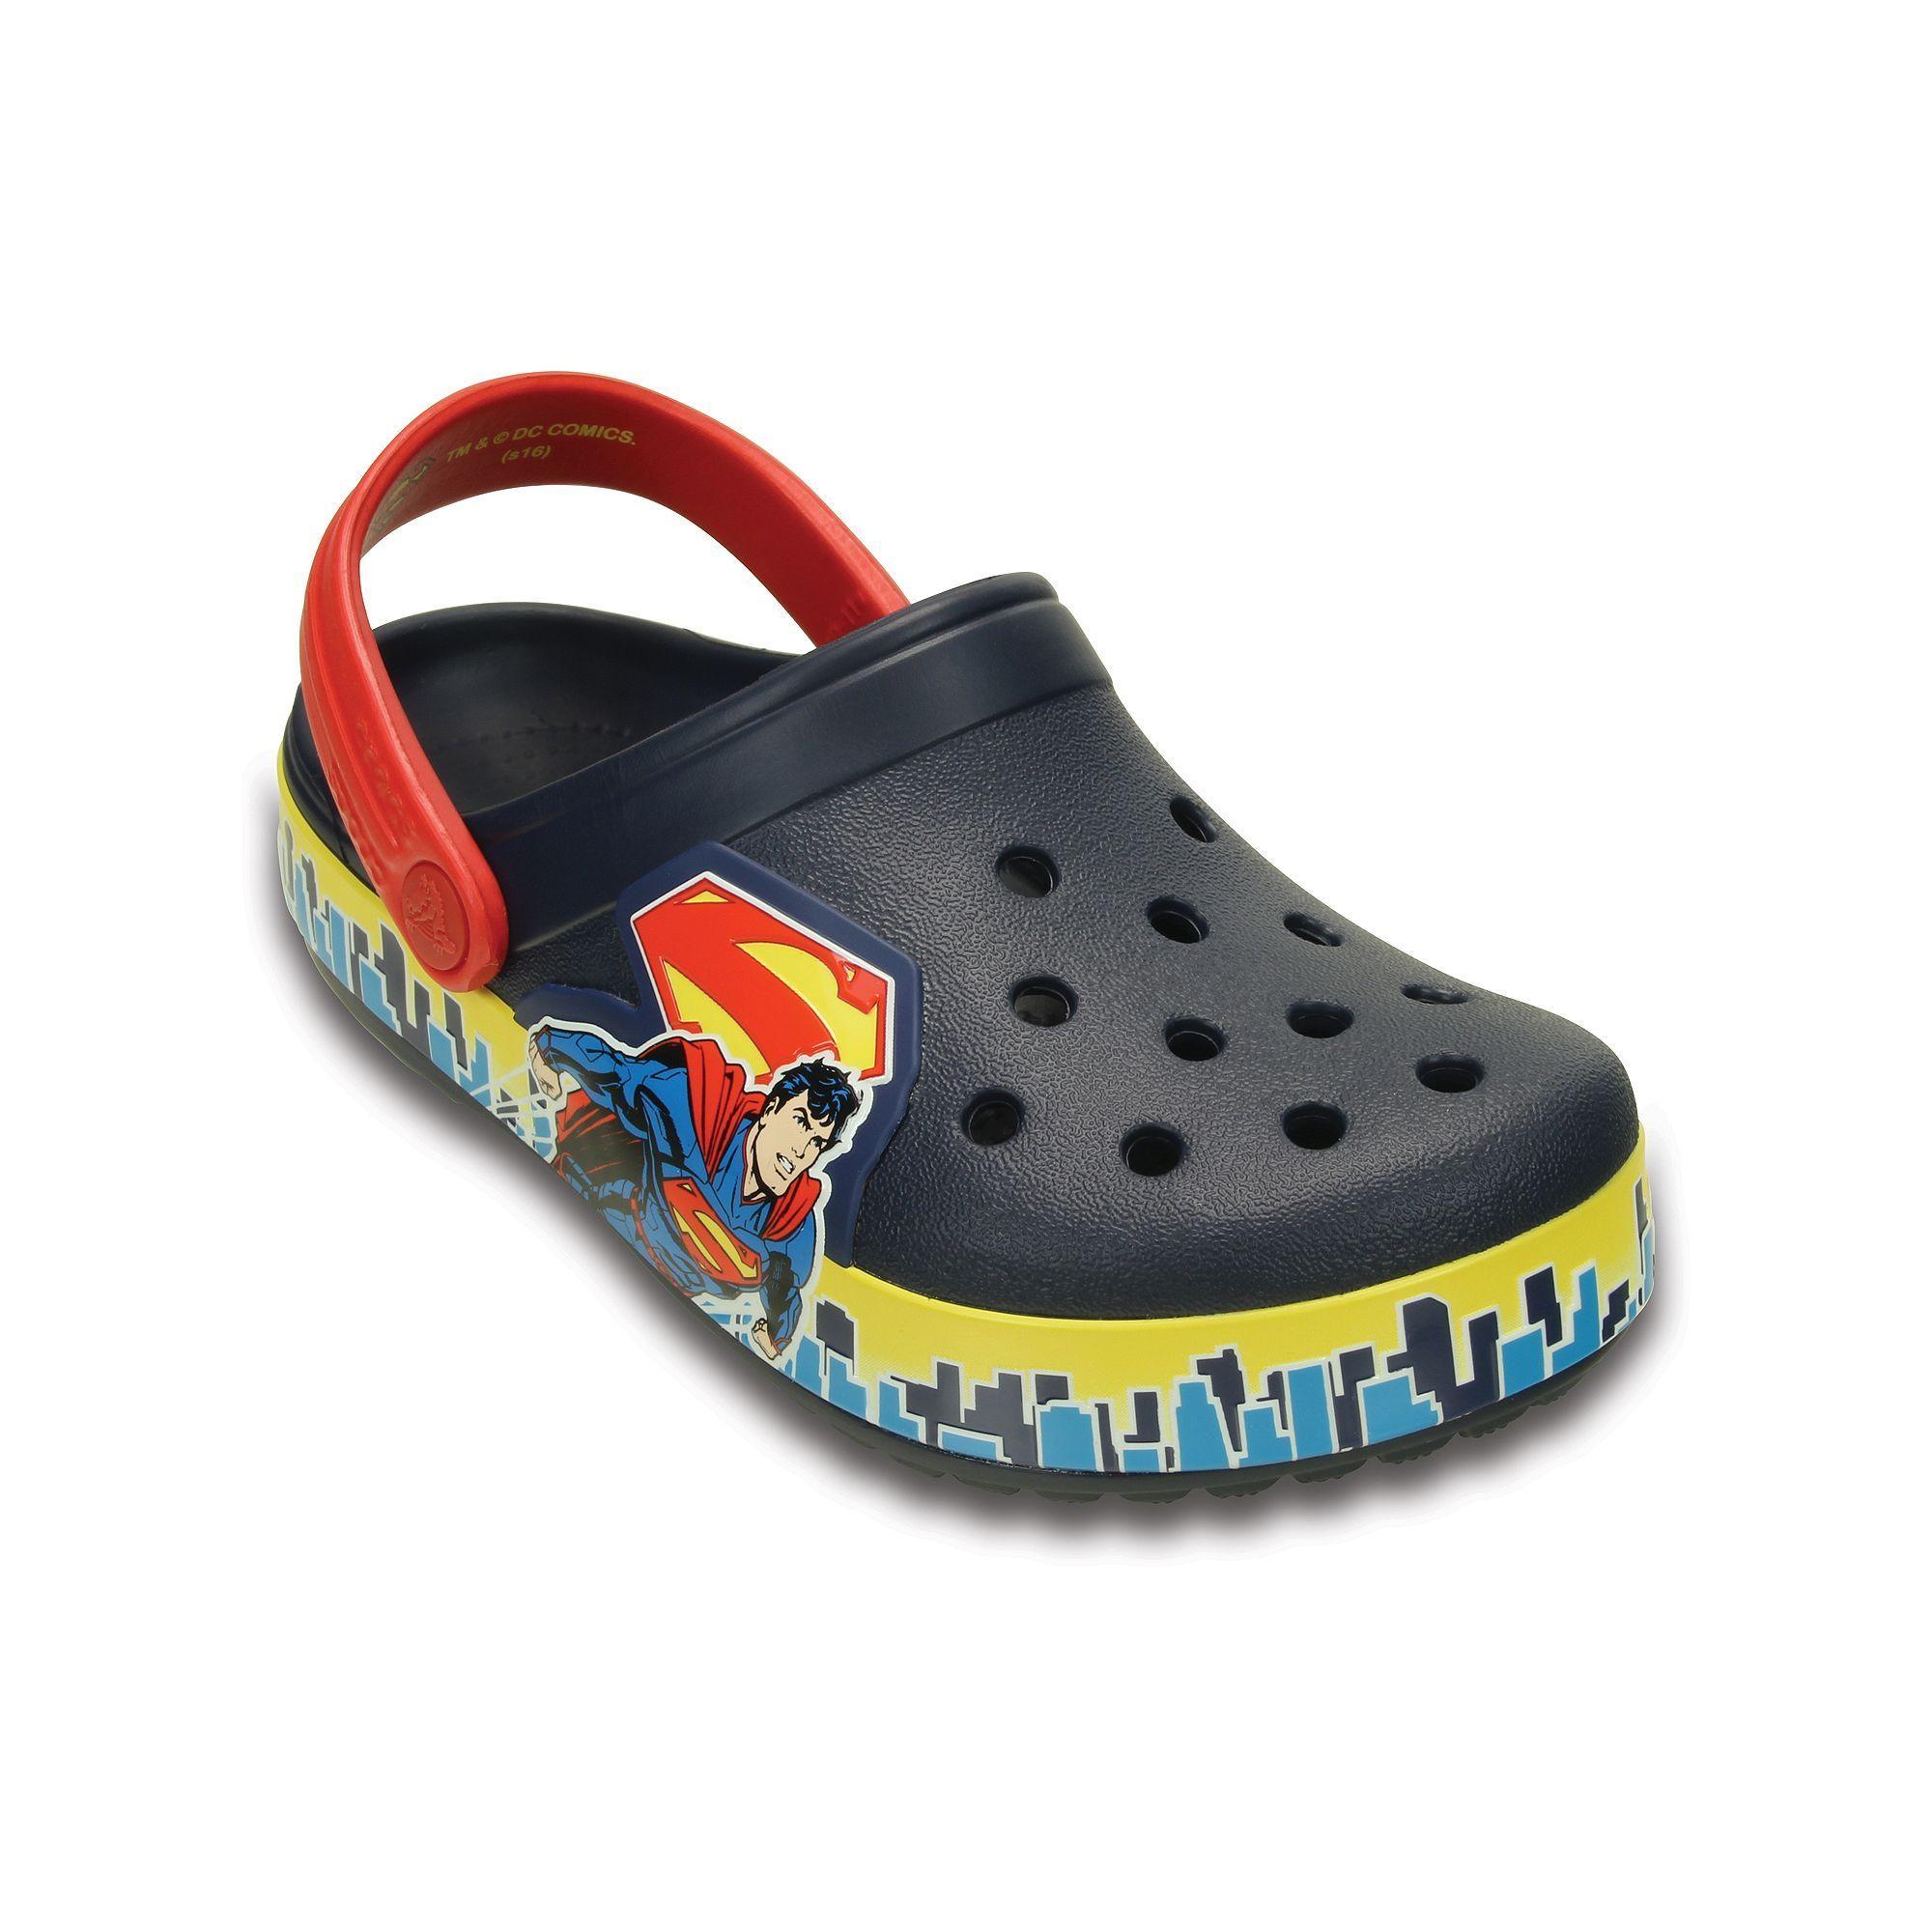 3bb1f003bca99 Crocs Crocband Superman Kids  Glow-In-The-Dark Clogs